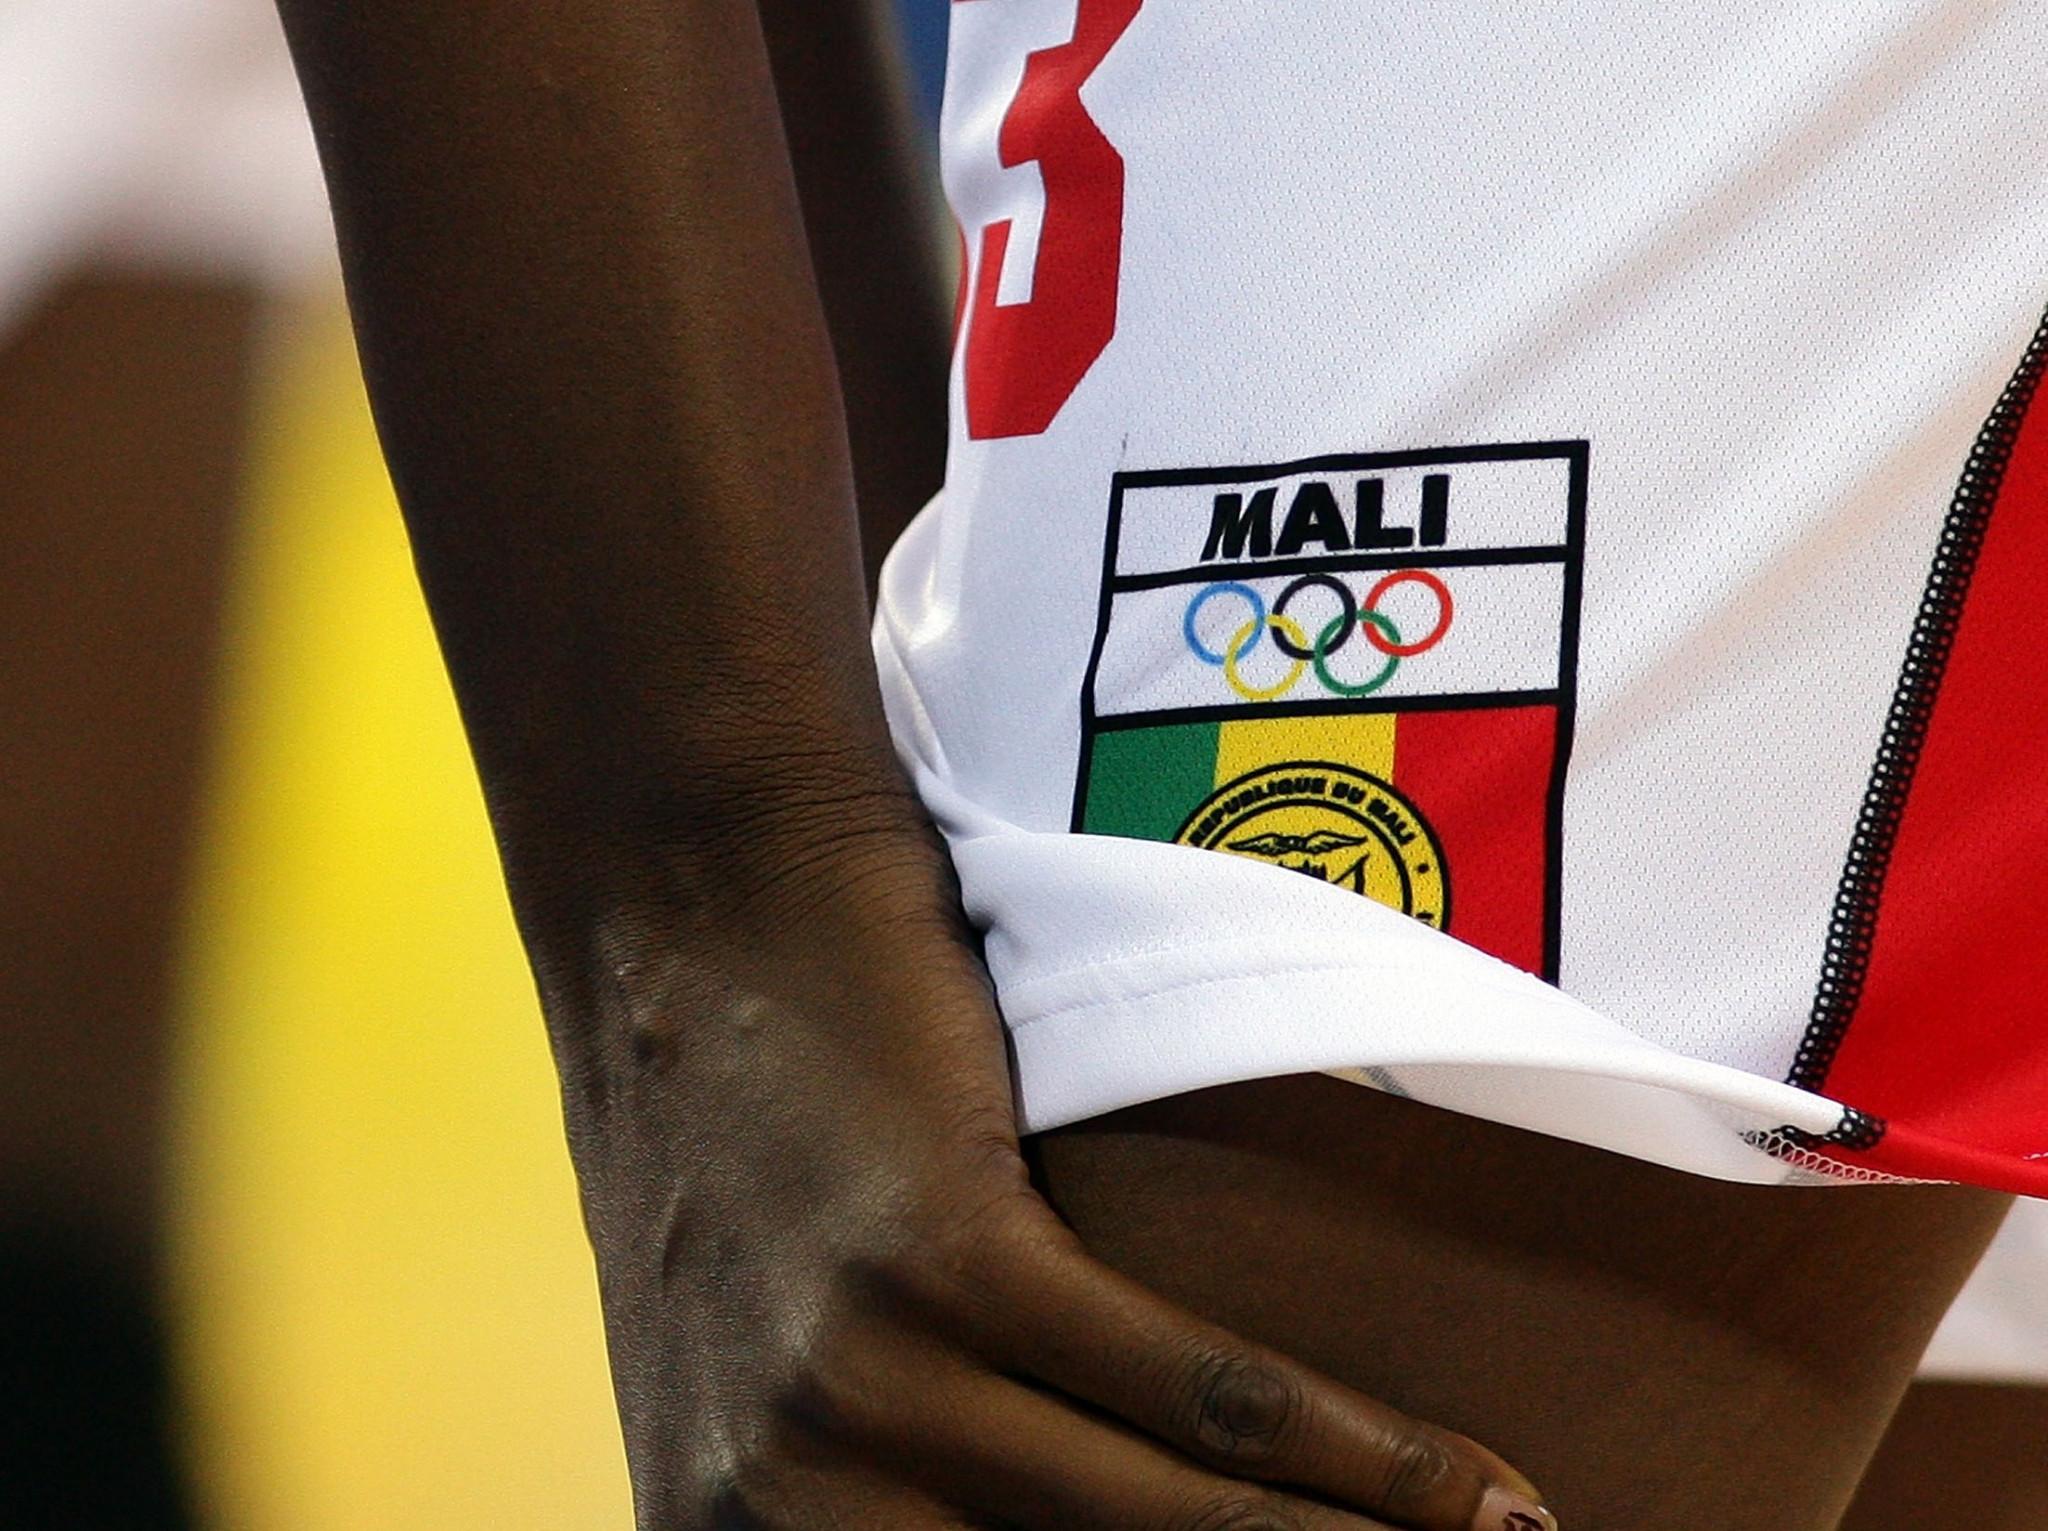 The Mali Basketball Federation has been slammed for applying